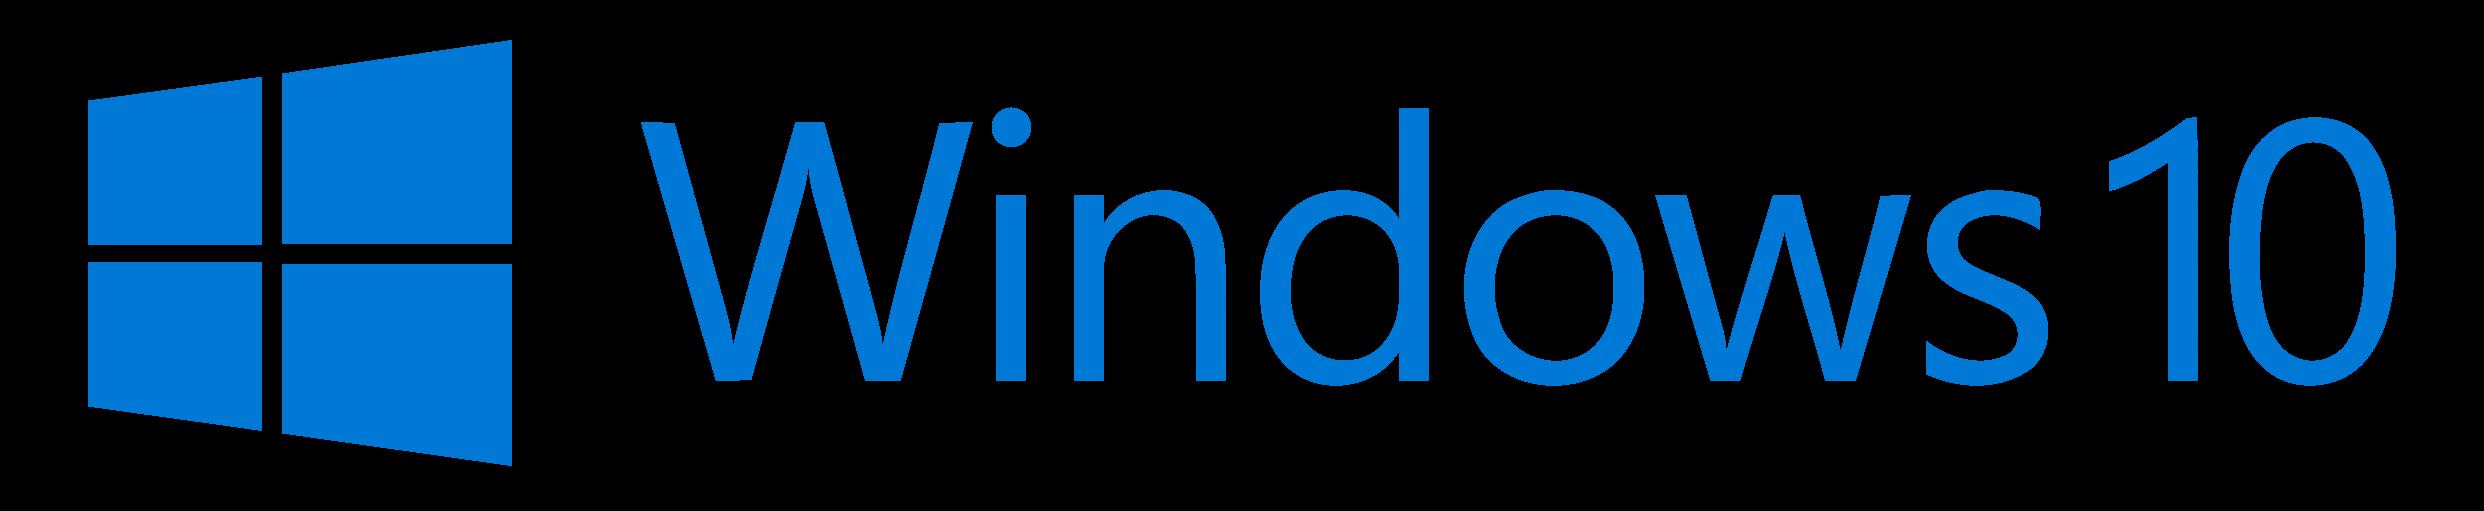 windows logosu